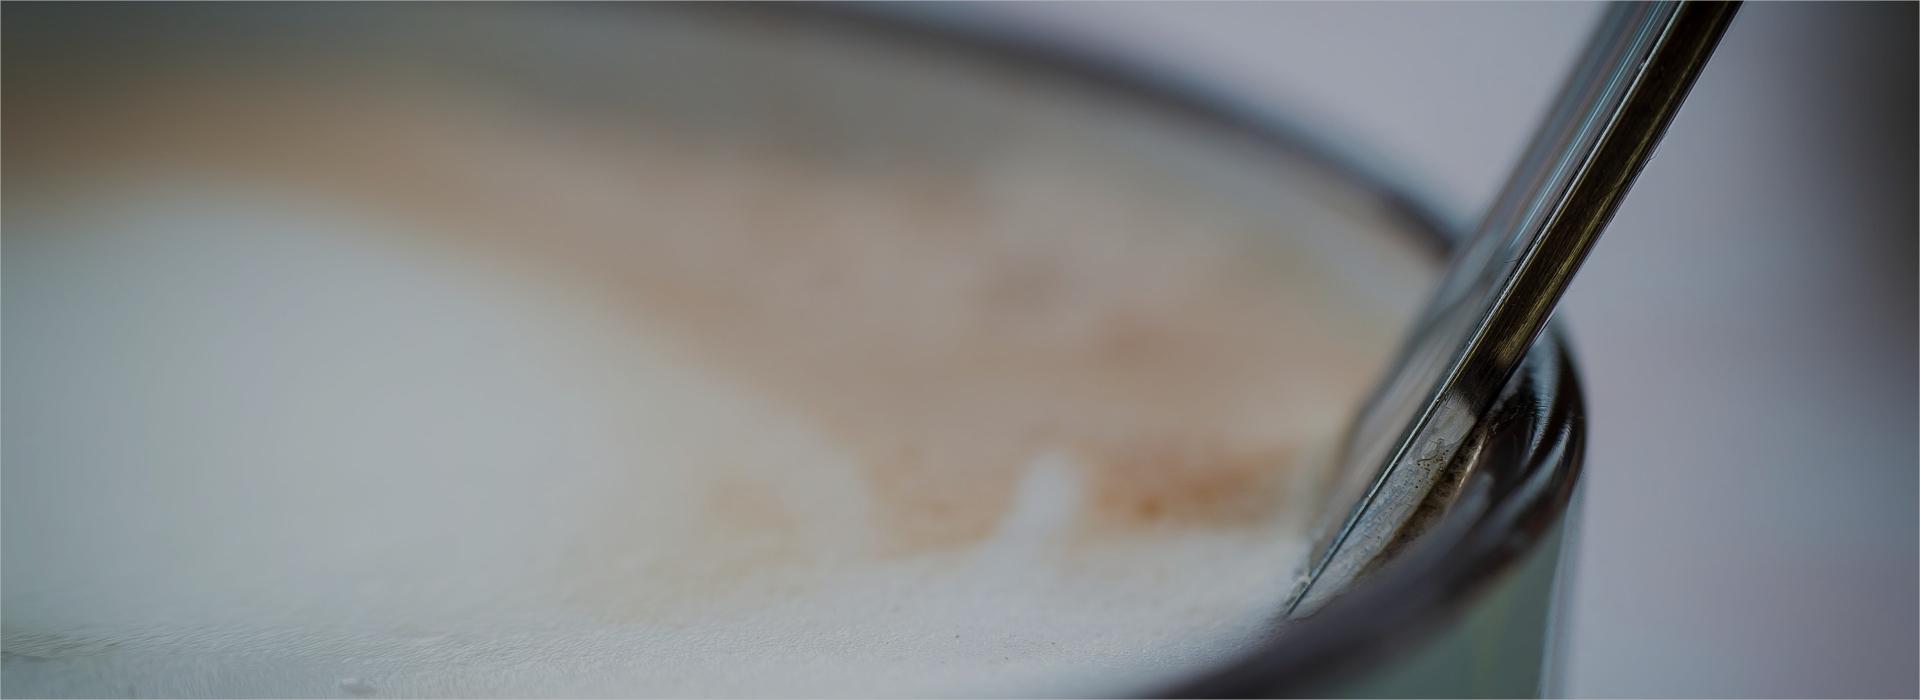 coffeelogo1